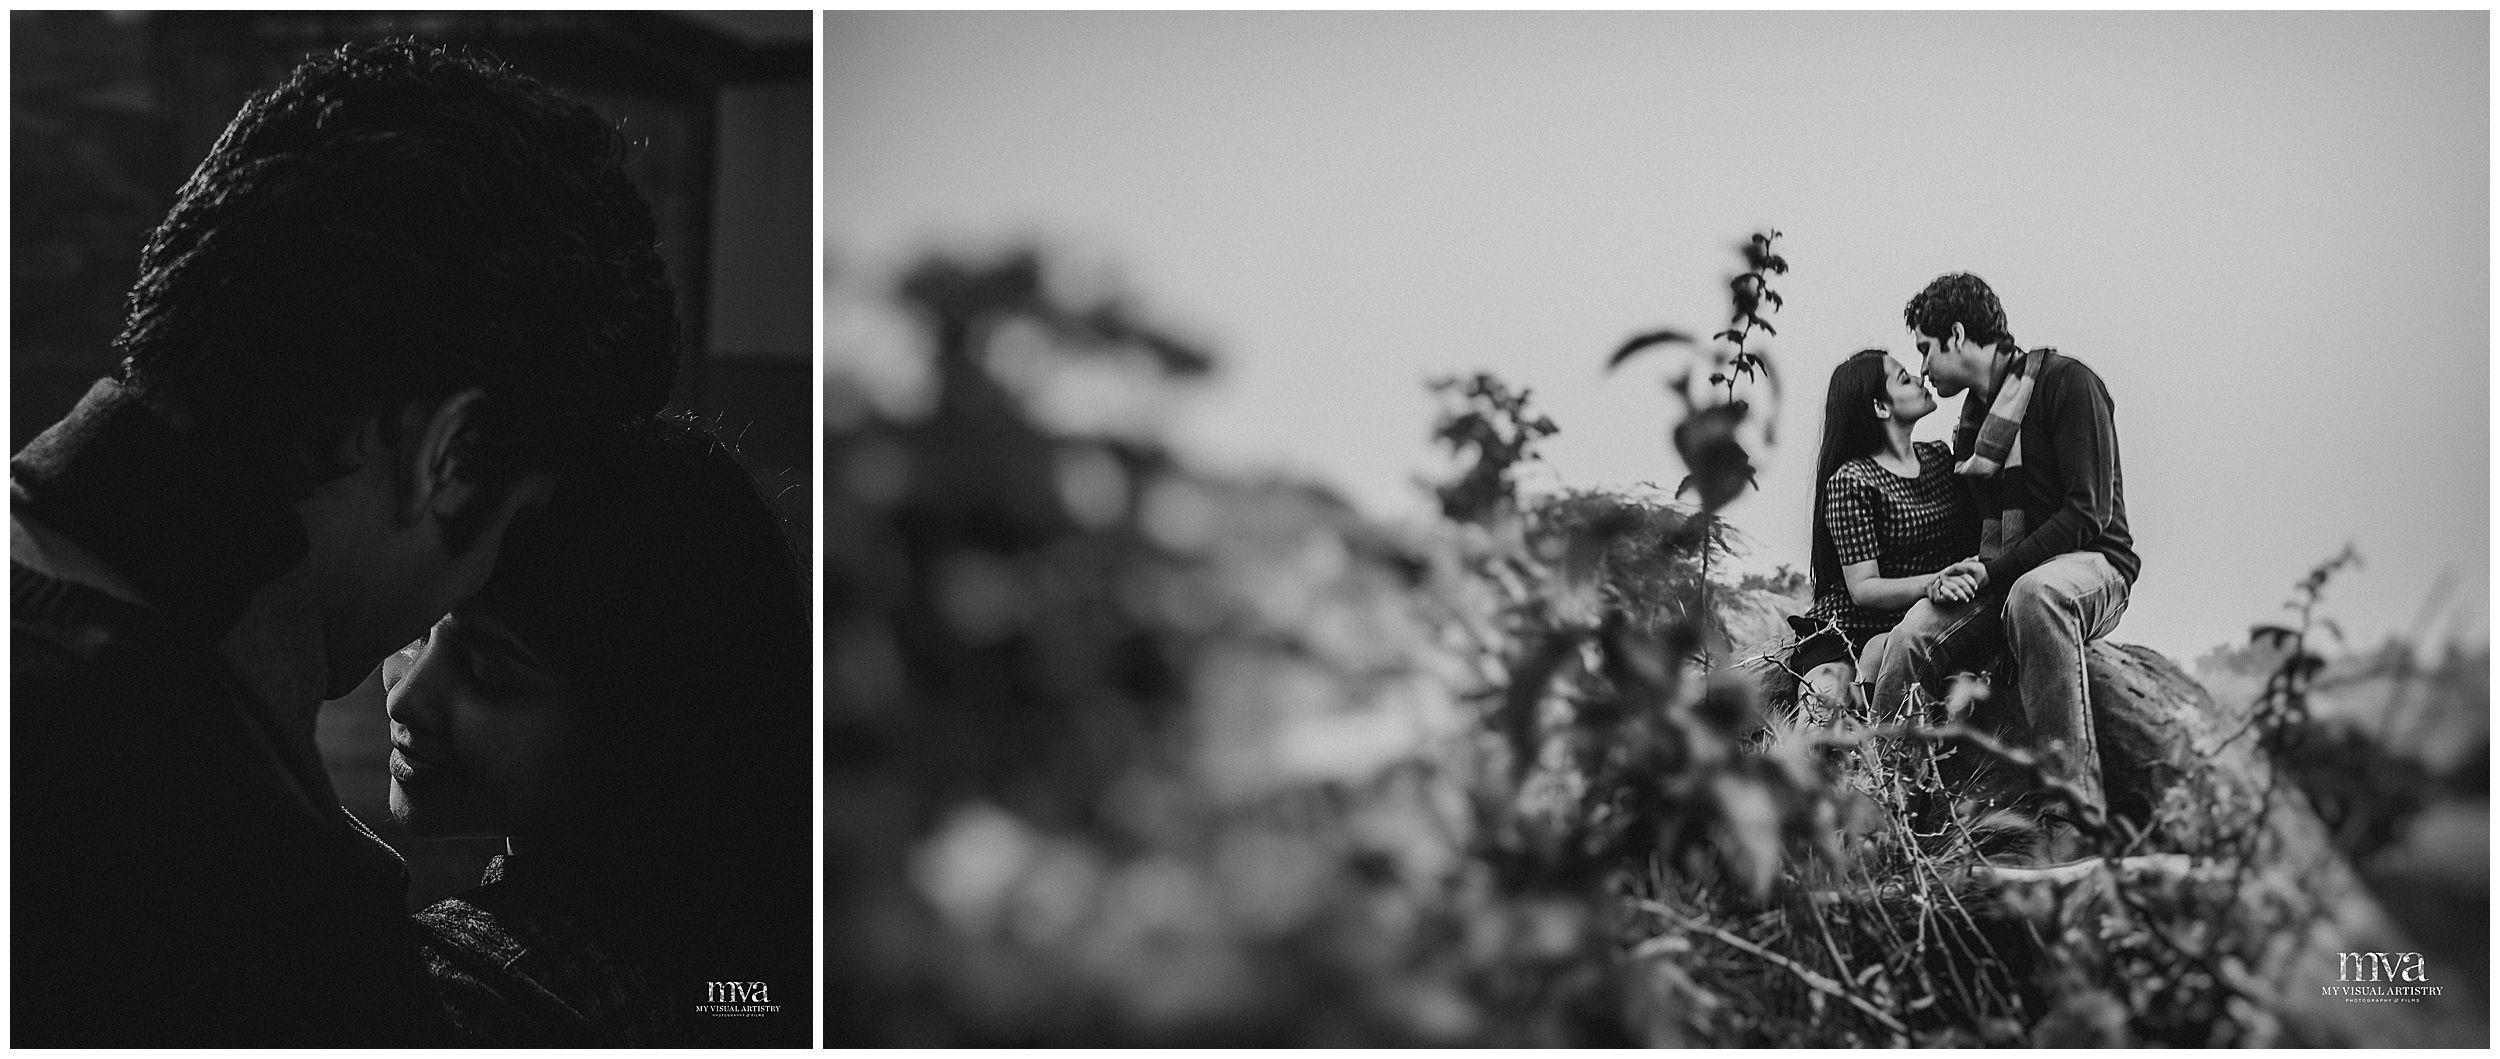 SAHIL_MANALI_MYVISUALARTISTRY__WEDDING_PHOTOGRAPHER_JANNATVALLEY_COUPLESHOOT_DESTINATION_FARIDABAD_PREWEDDING4.jpg